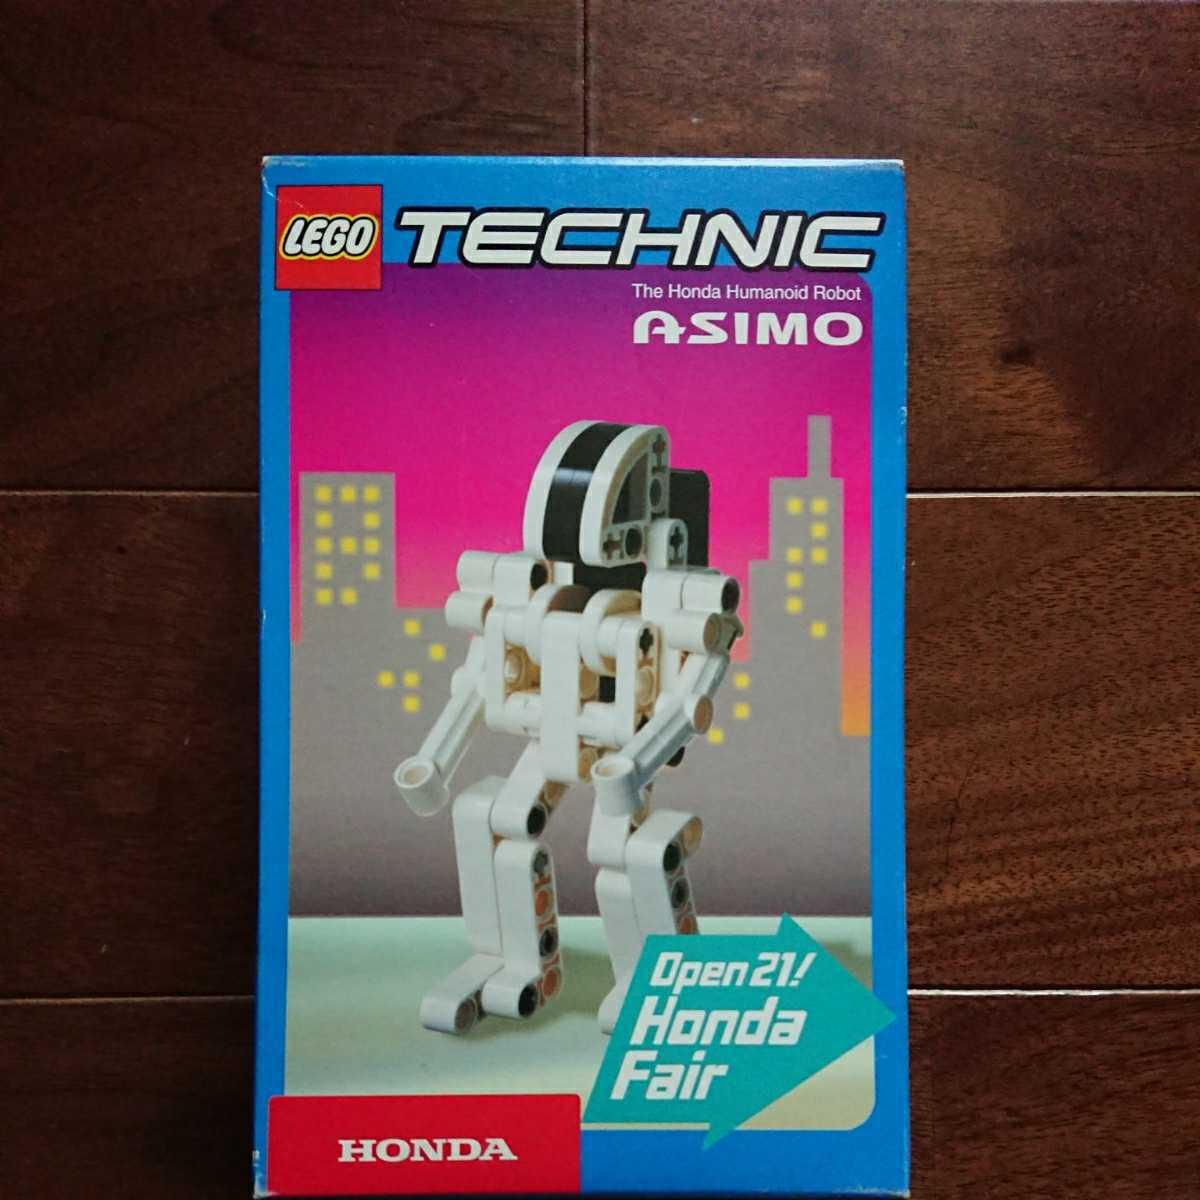 LEGO レゴ テクニック アシモ HONDA ASIMO 未開封_画像1